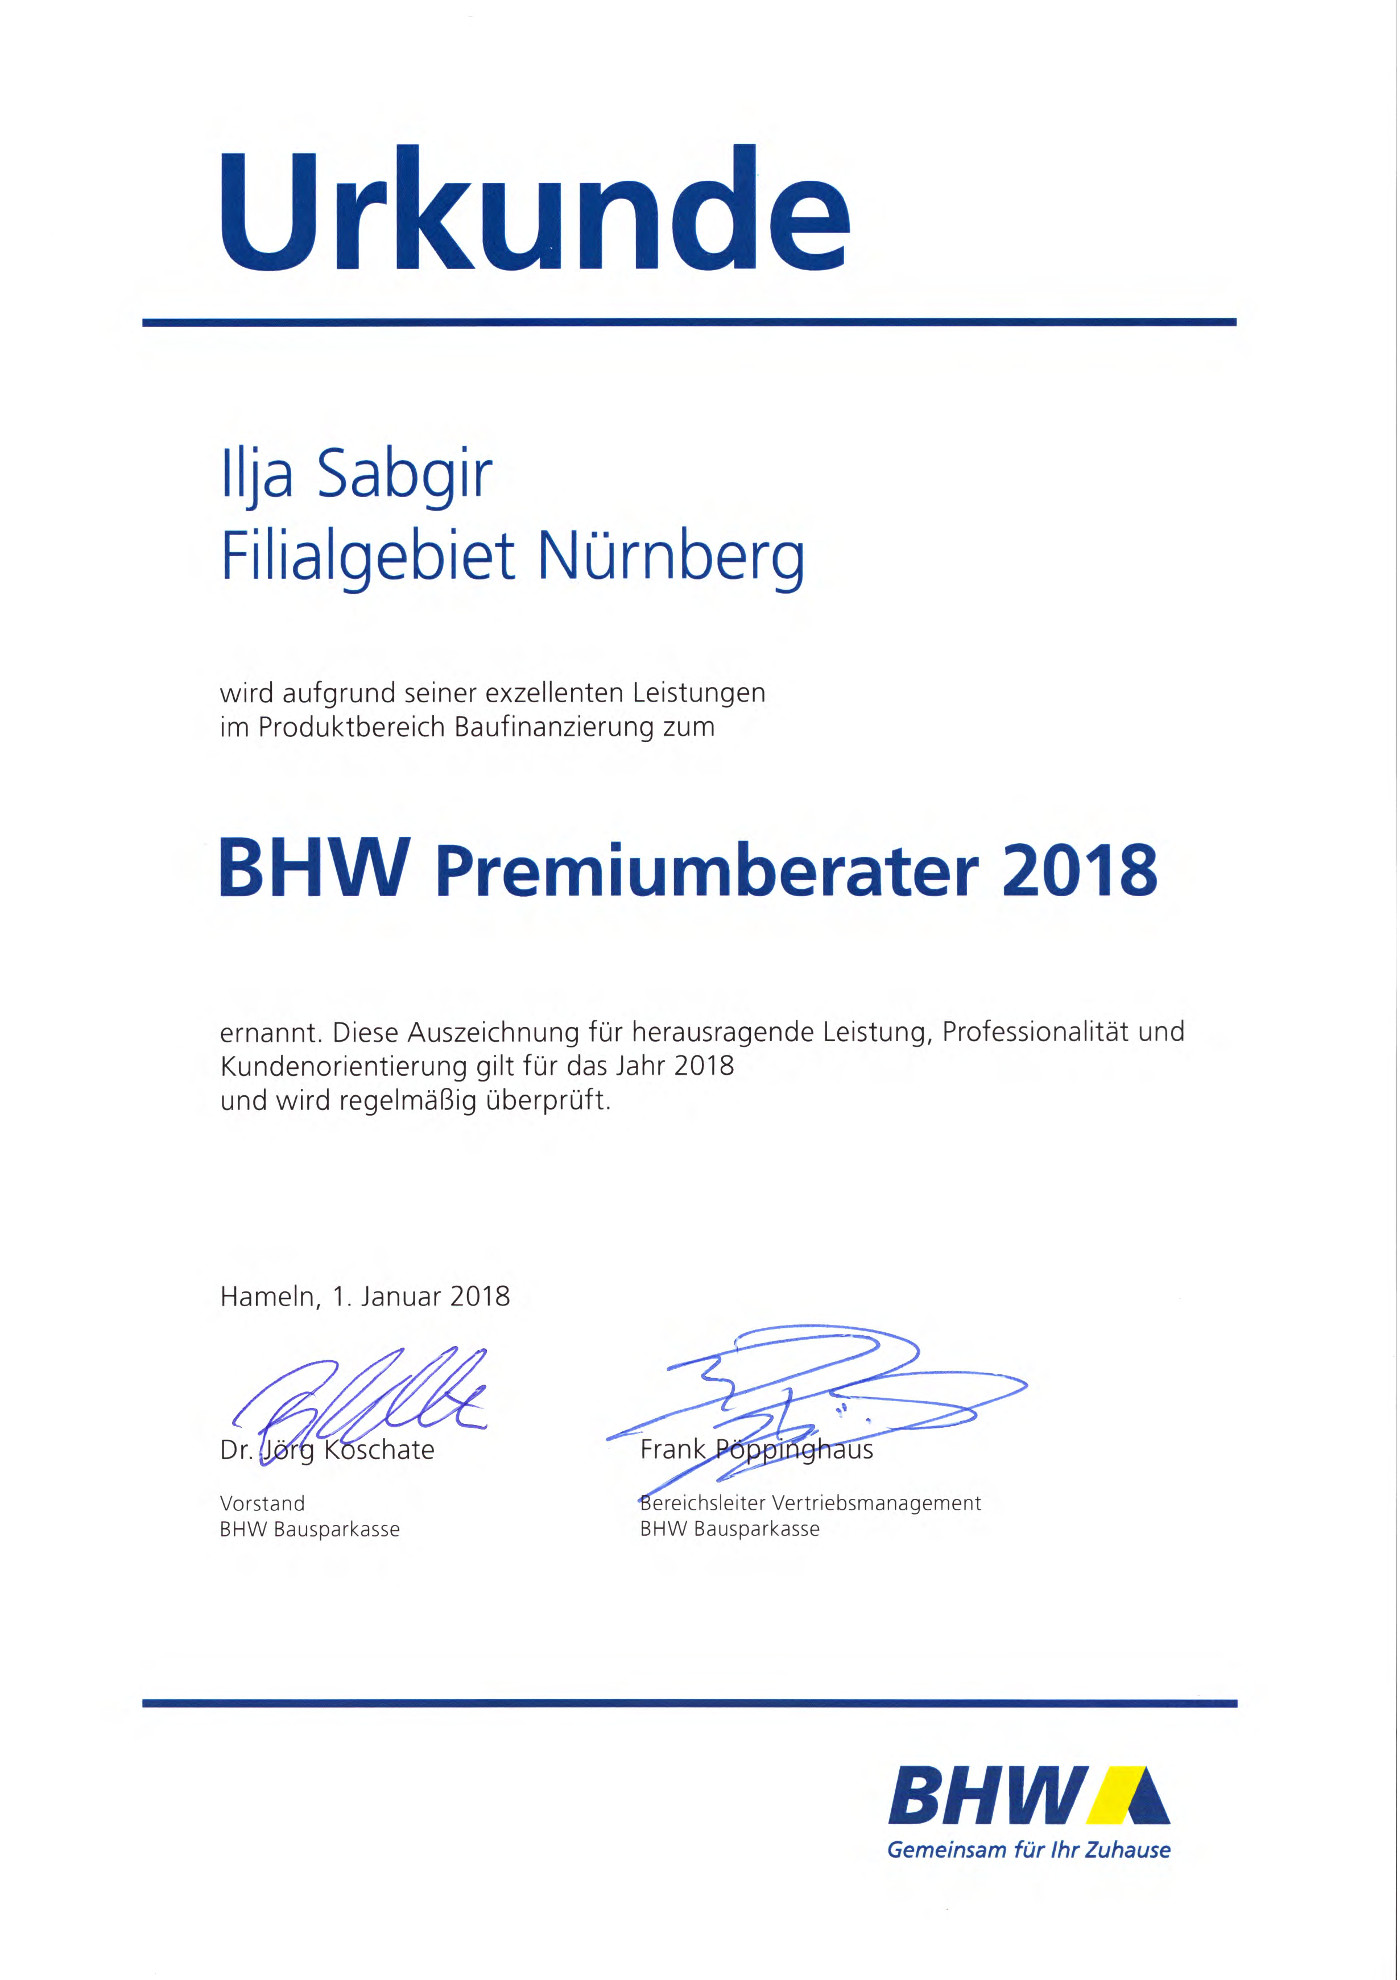 Zertifikat BHW Premiumberater